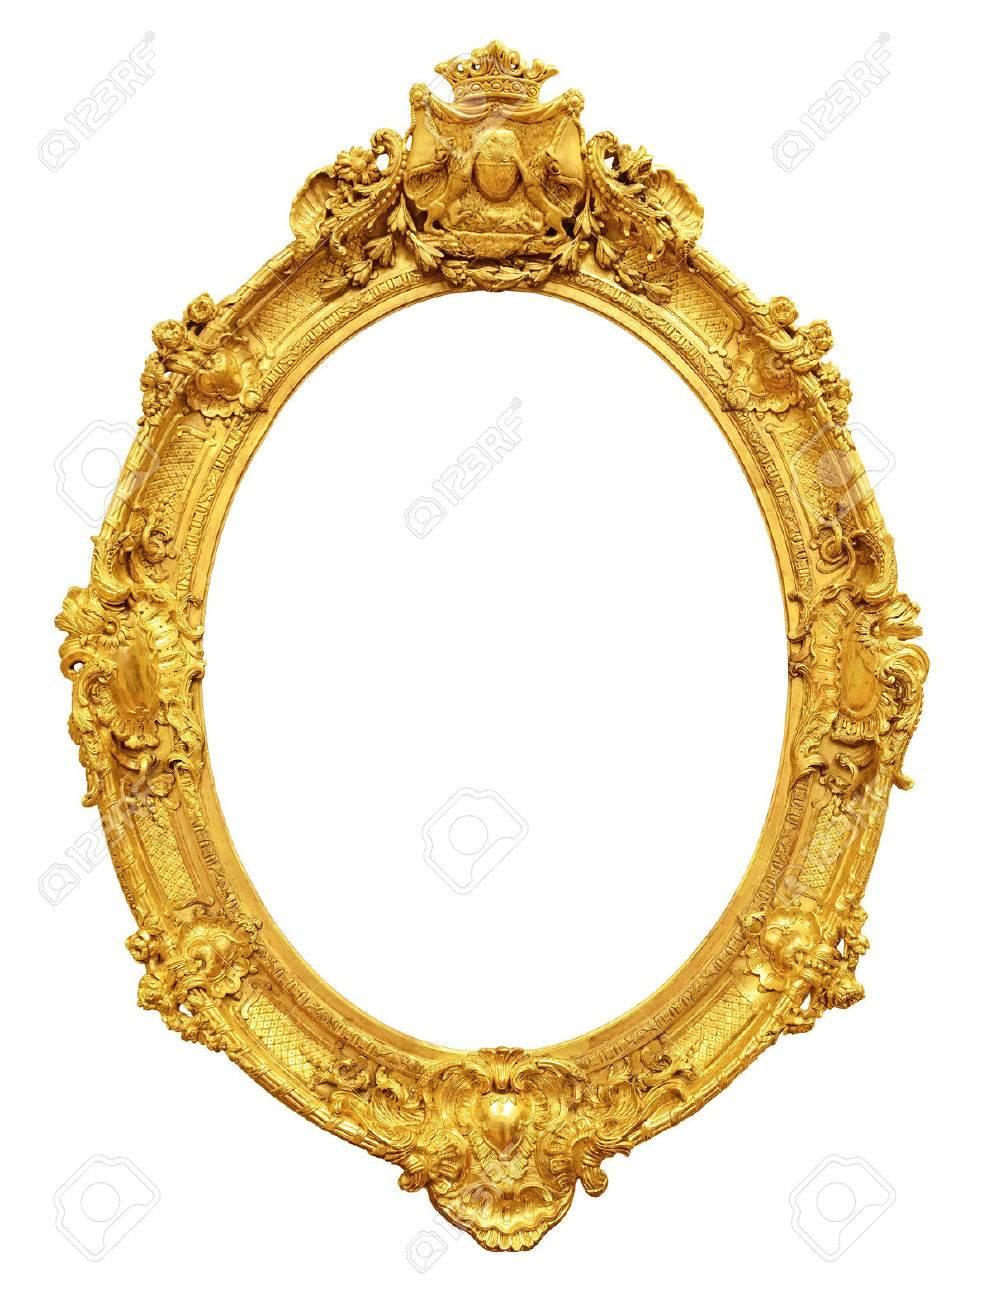 Gold vintage frame isolated on white background Stock Photo - 48507028